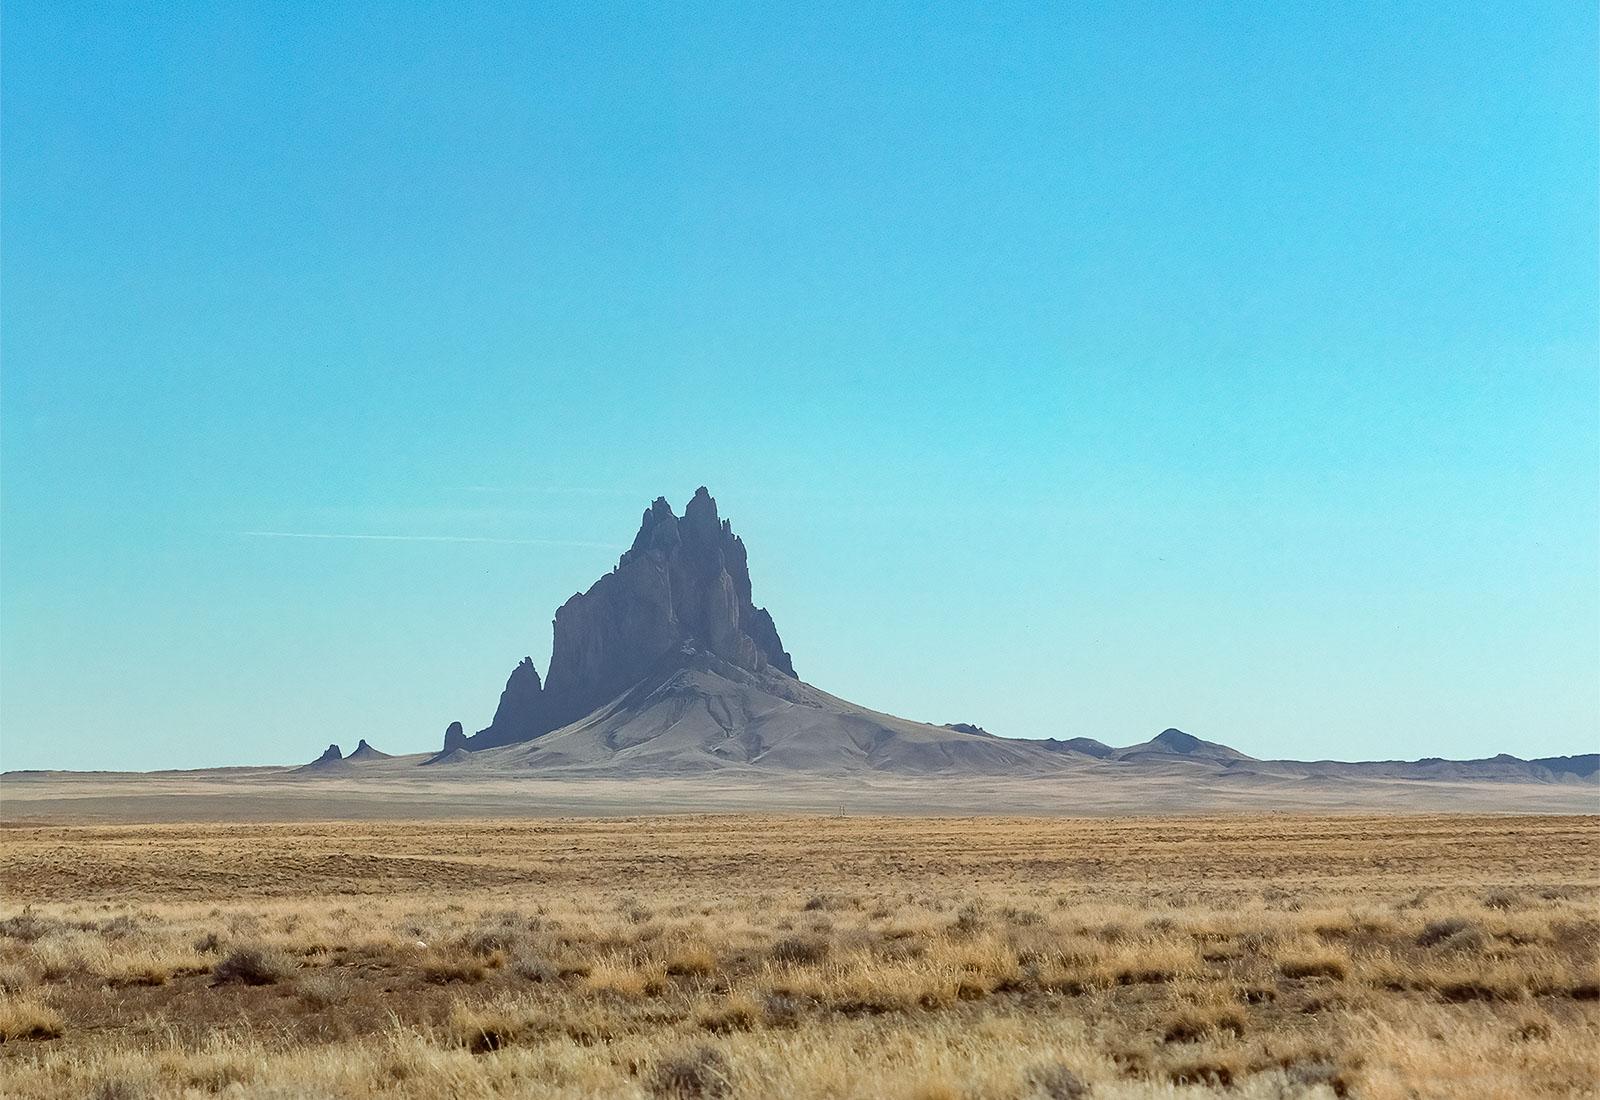 Ship Rock, a monadnock rising 1,583 feet in Navajo Nation, New Mexico